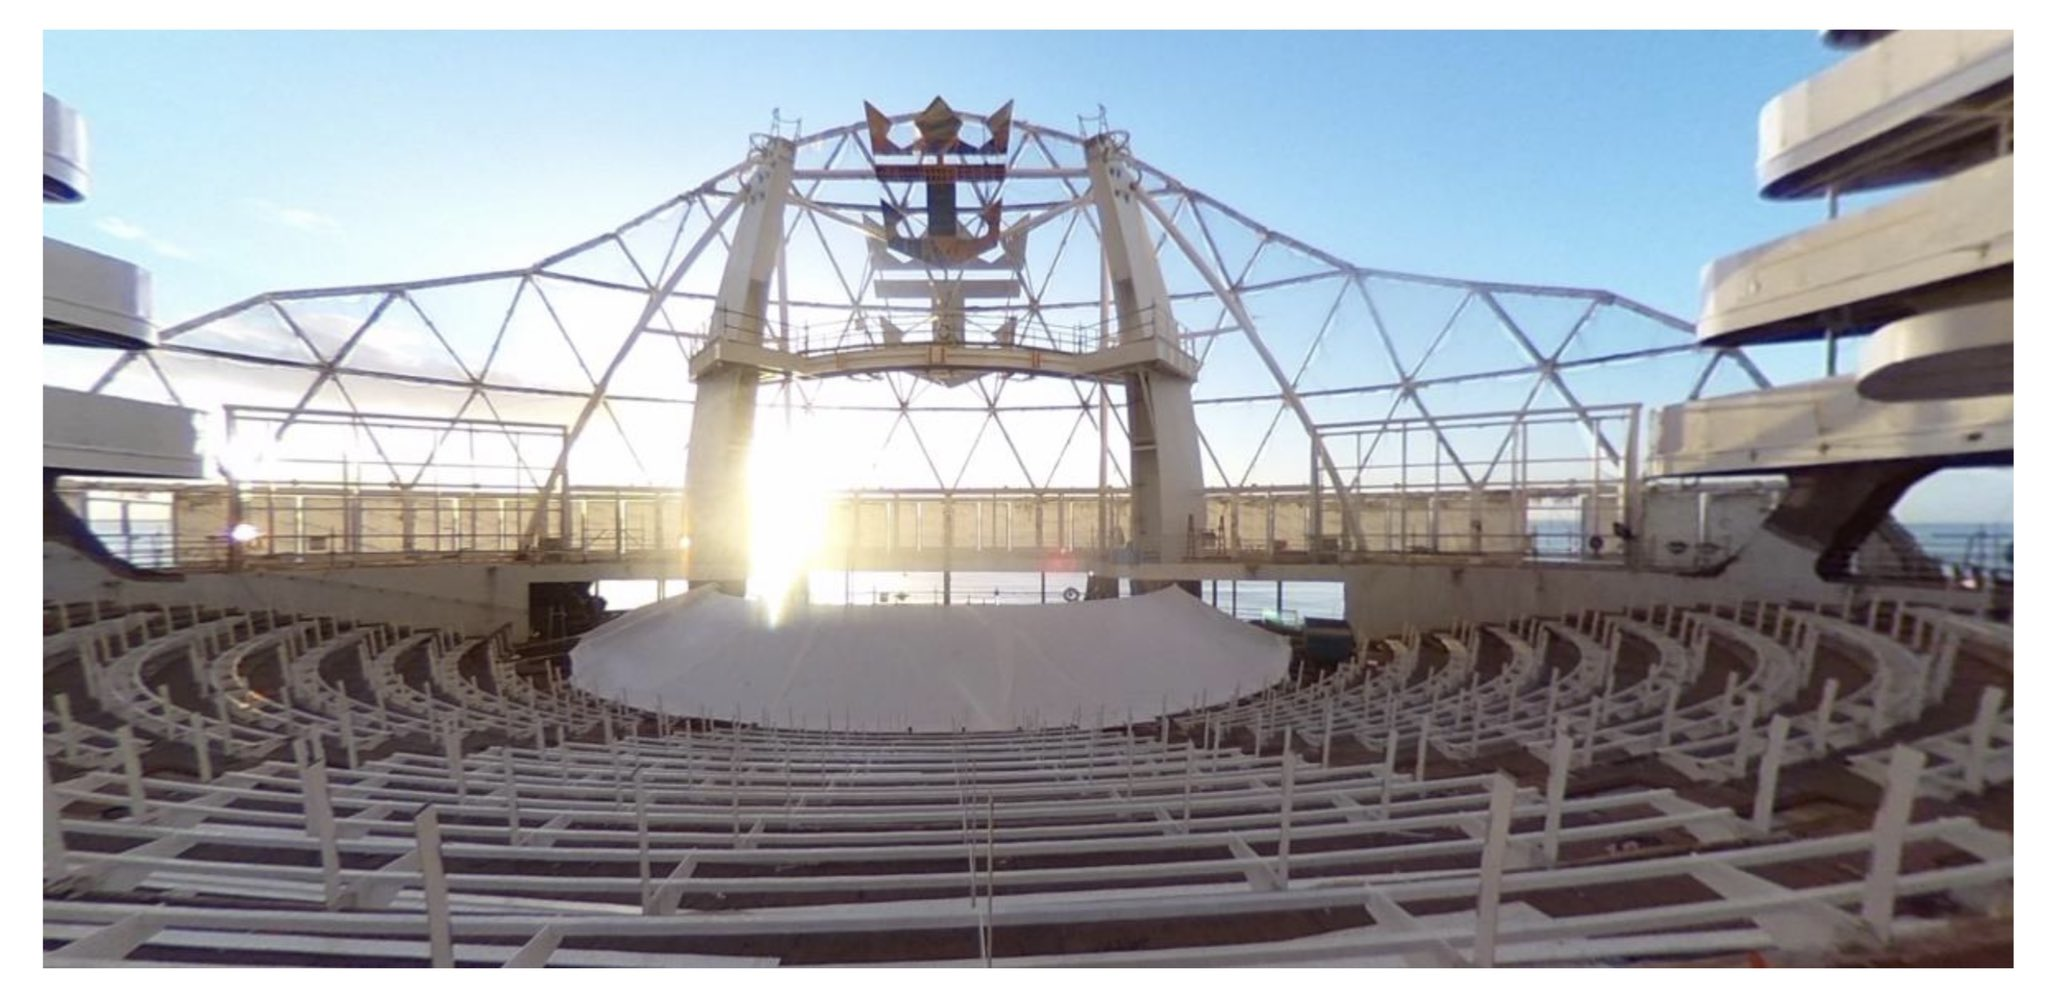 First Look At Aquatheater On Royal Caribbean S Wonder Of The Seas Royal Caribbean Blog